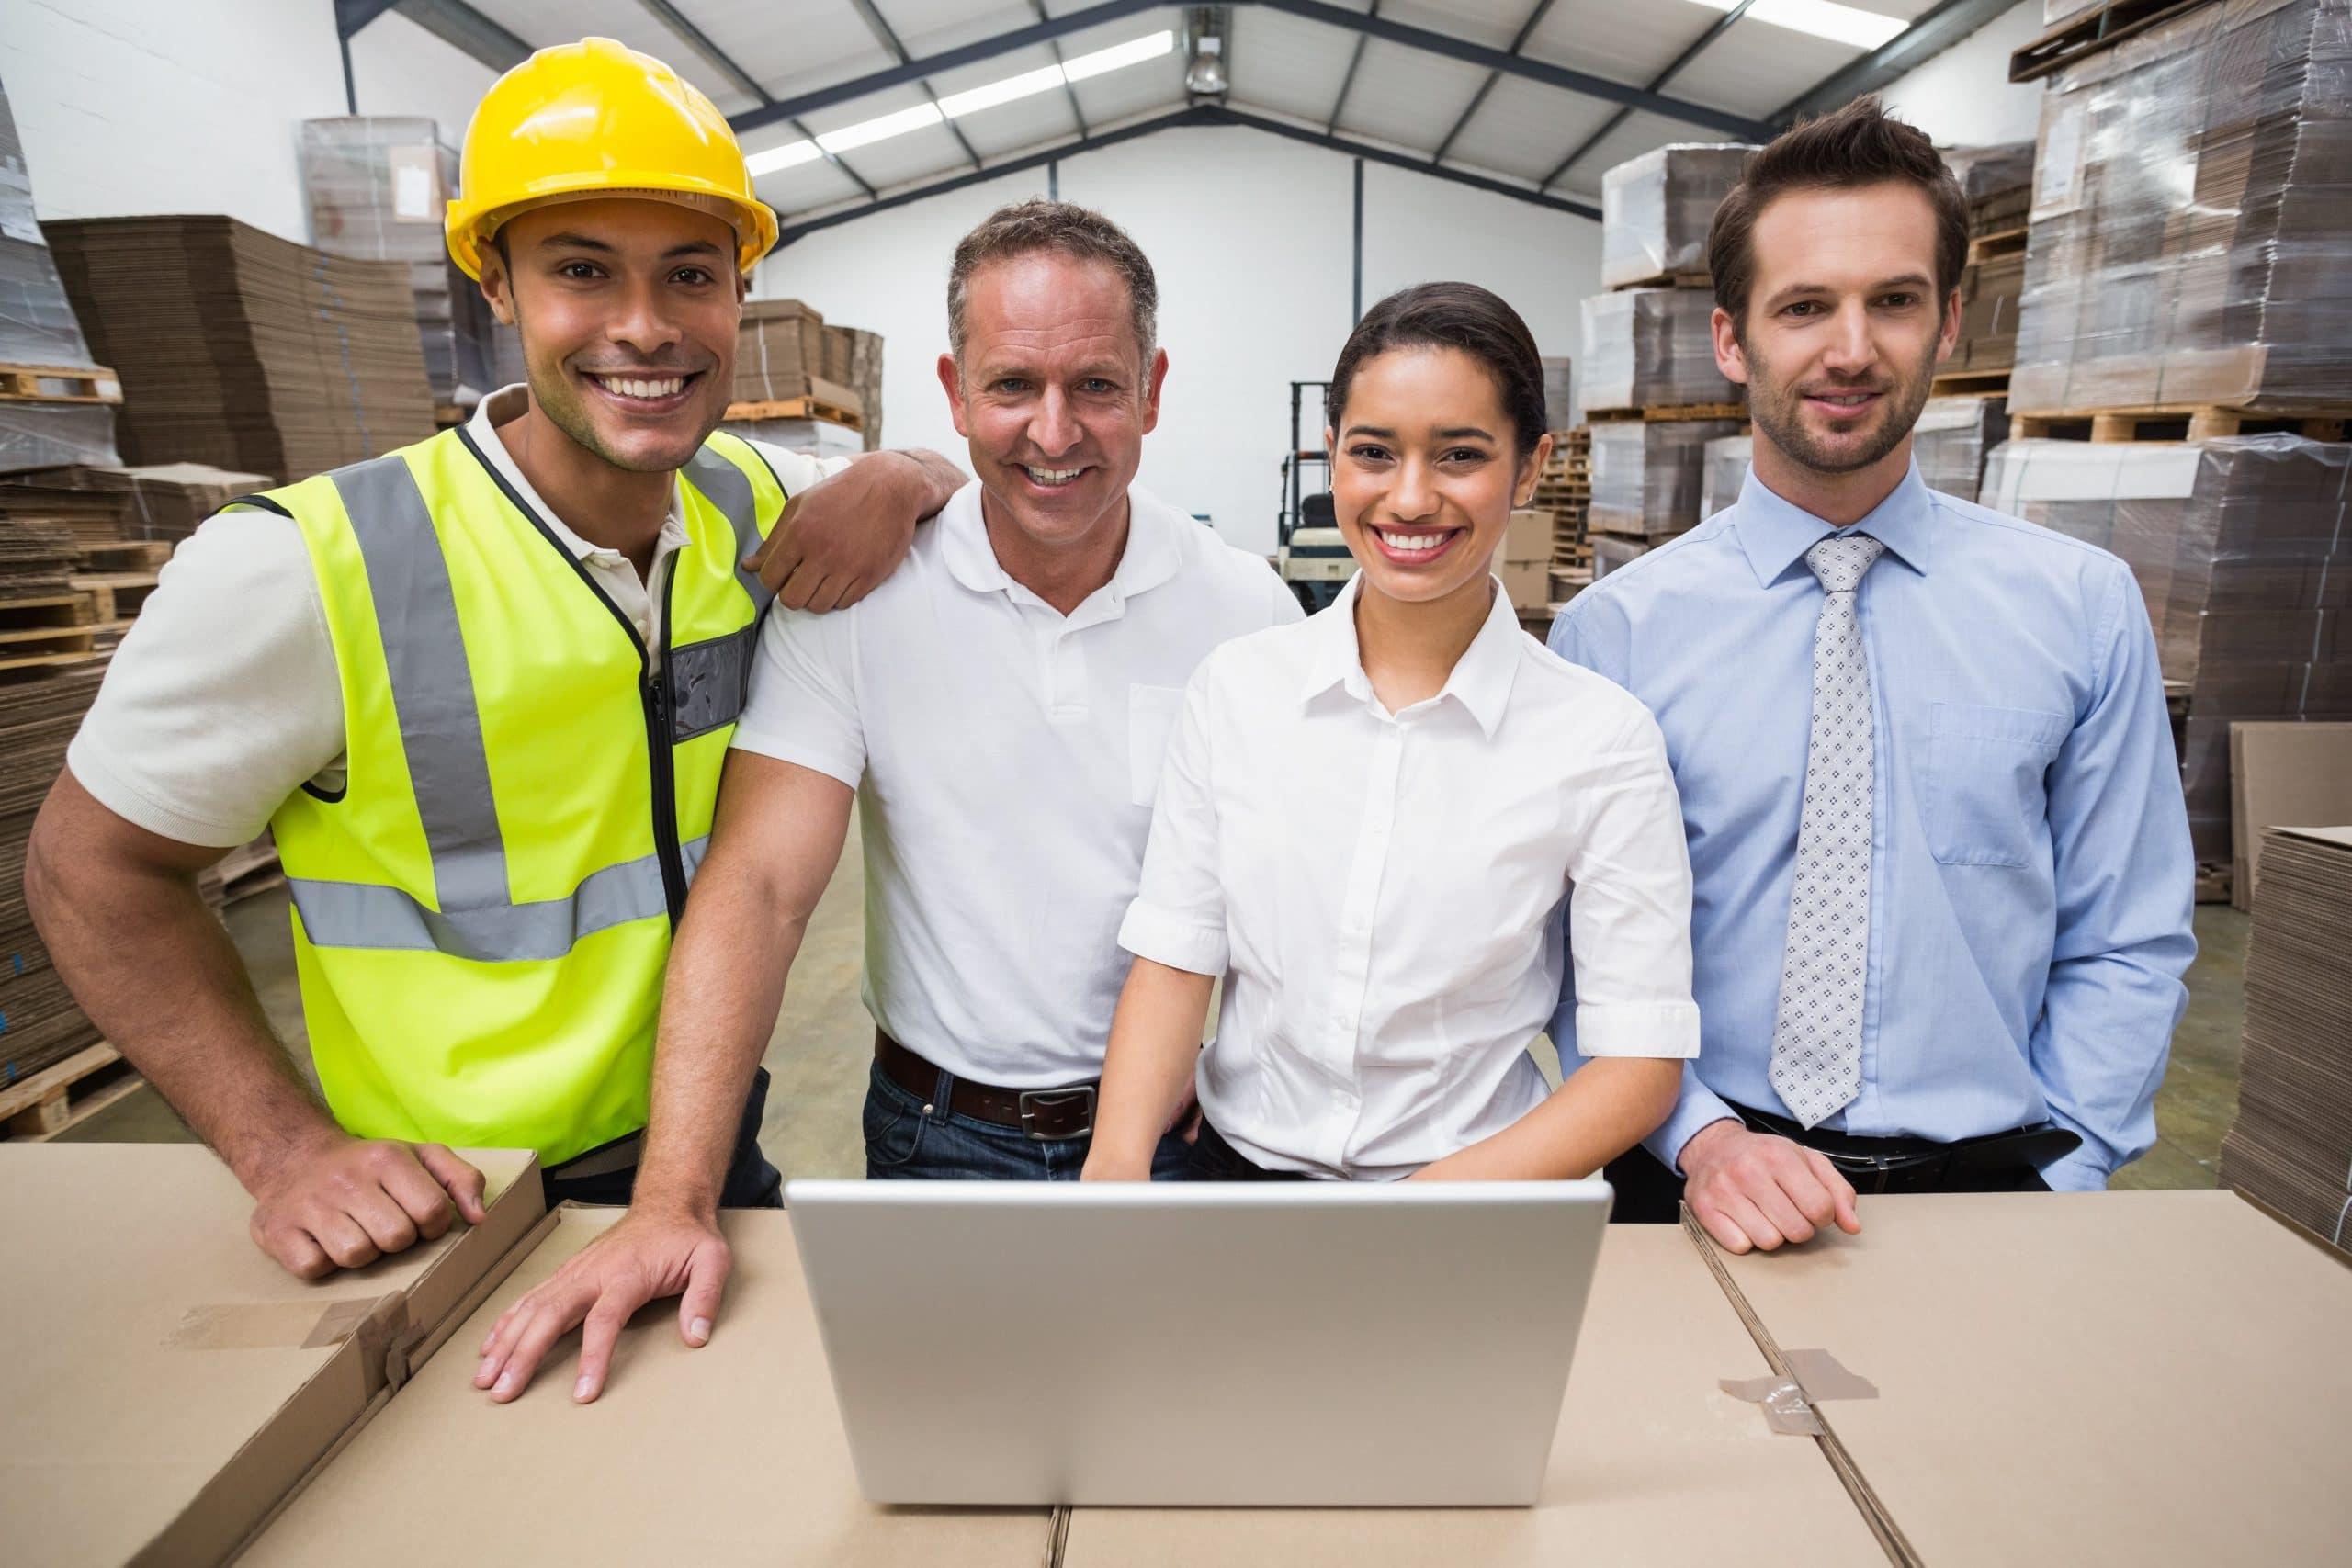 Five Easy Metrics to Measure Investment in Employee Development